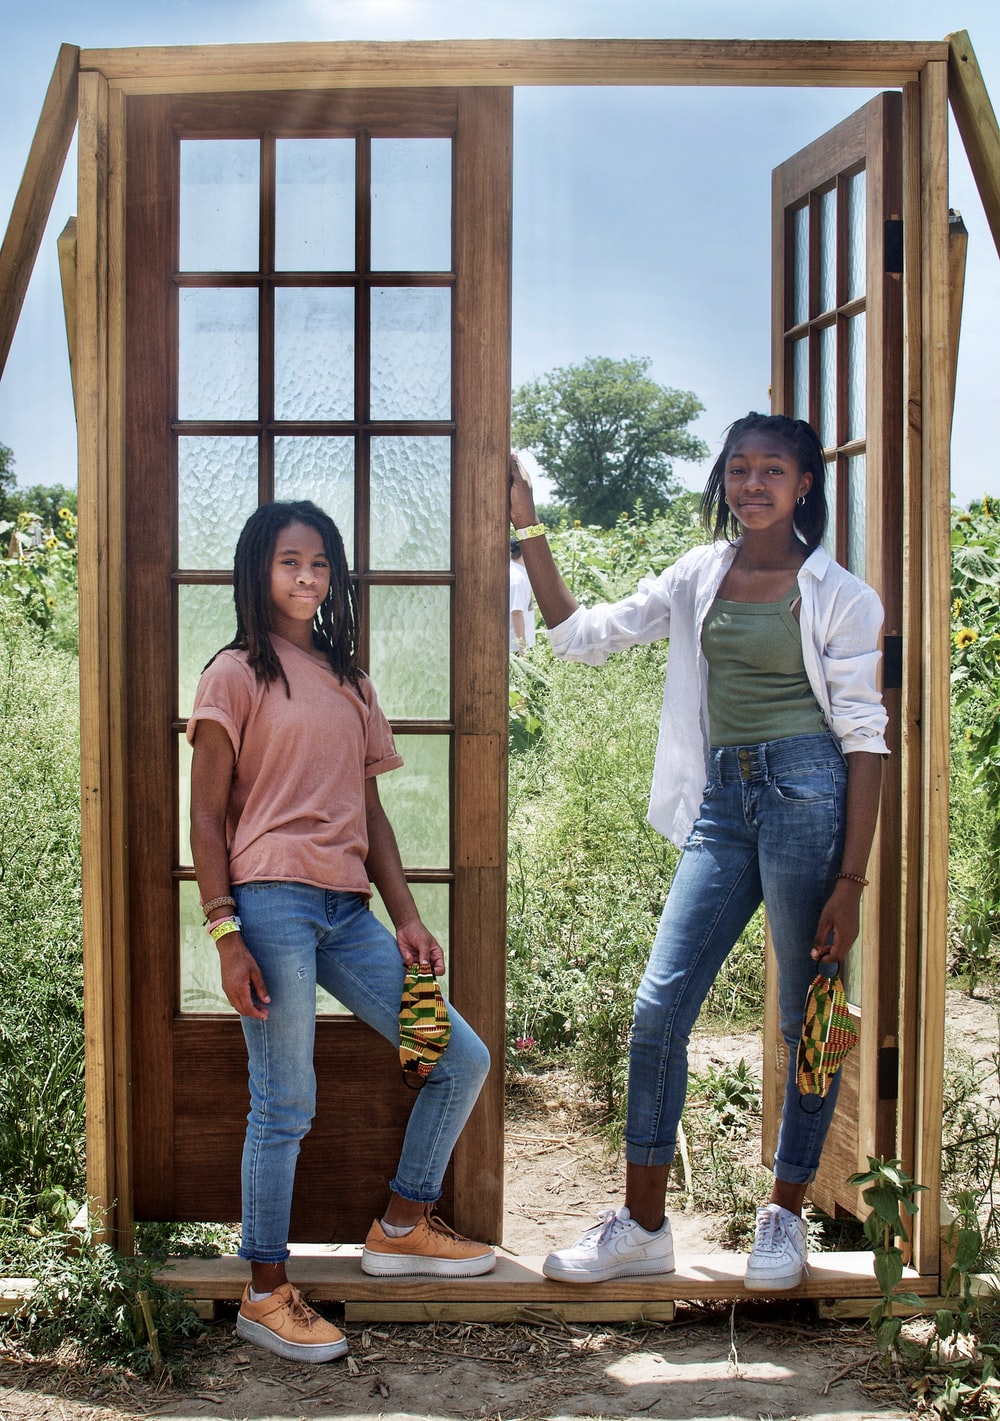 2 women standing beside brown wooden framed glass window during daytime